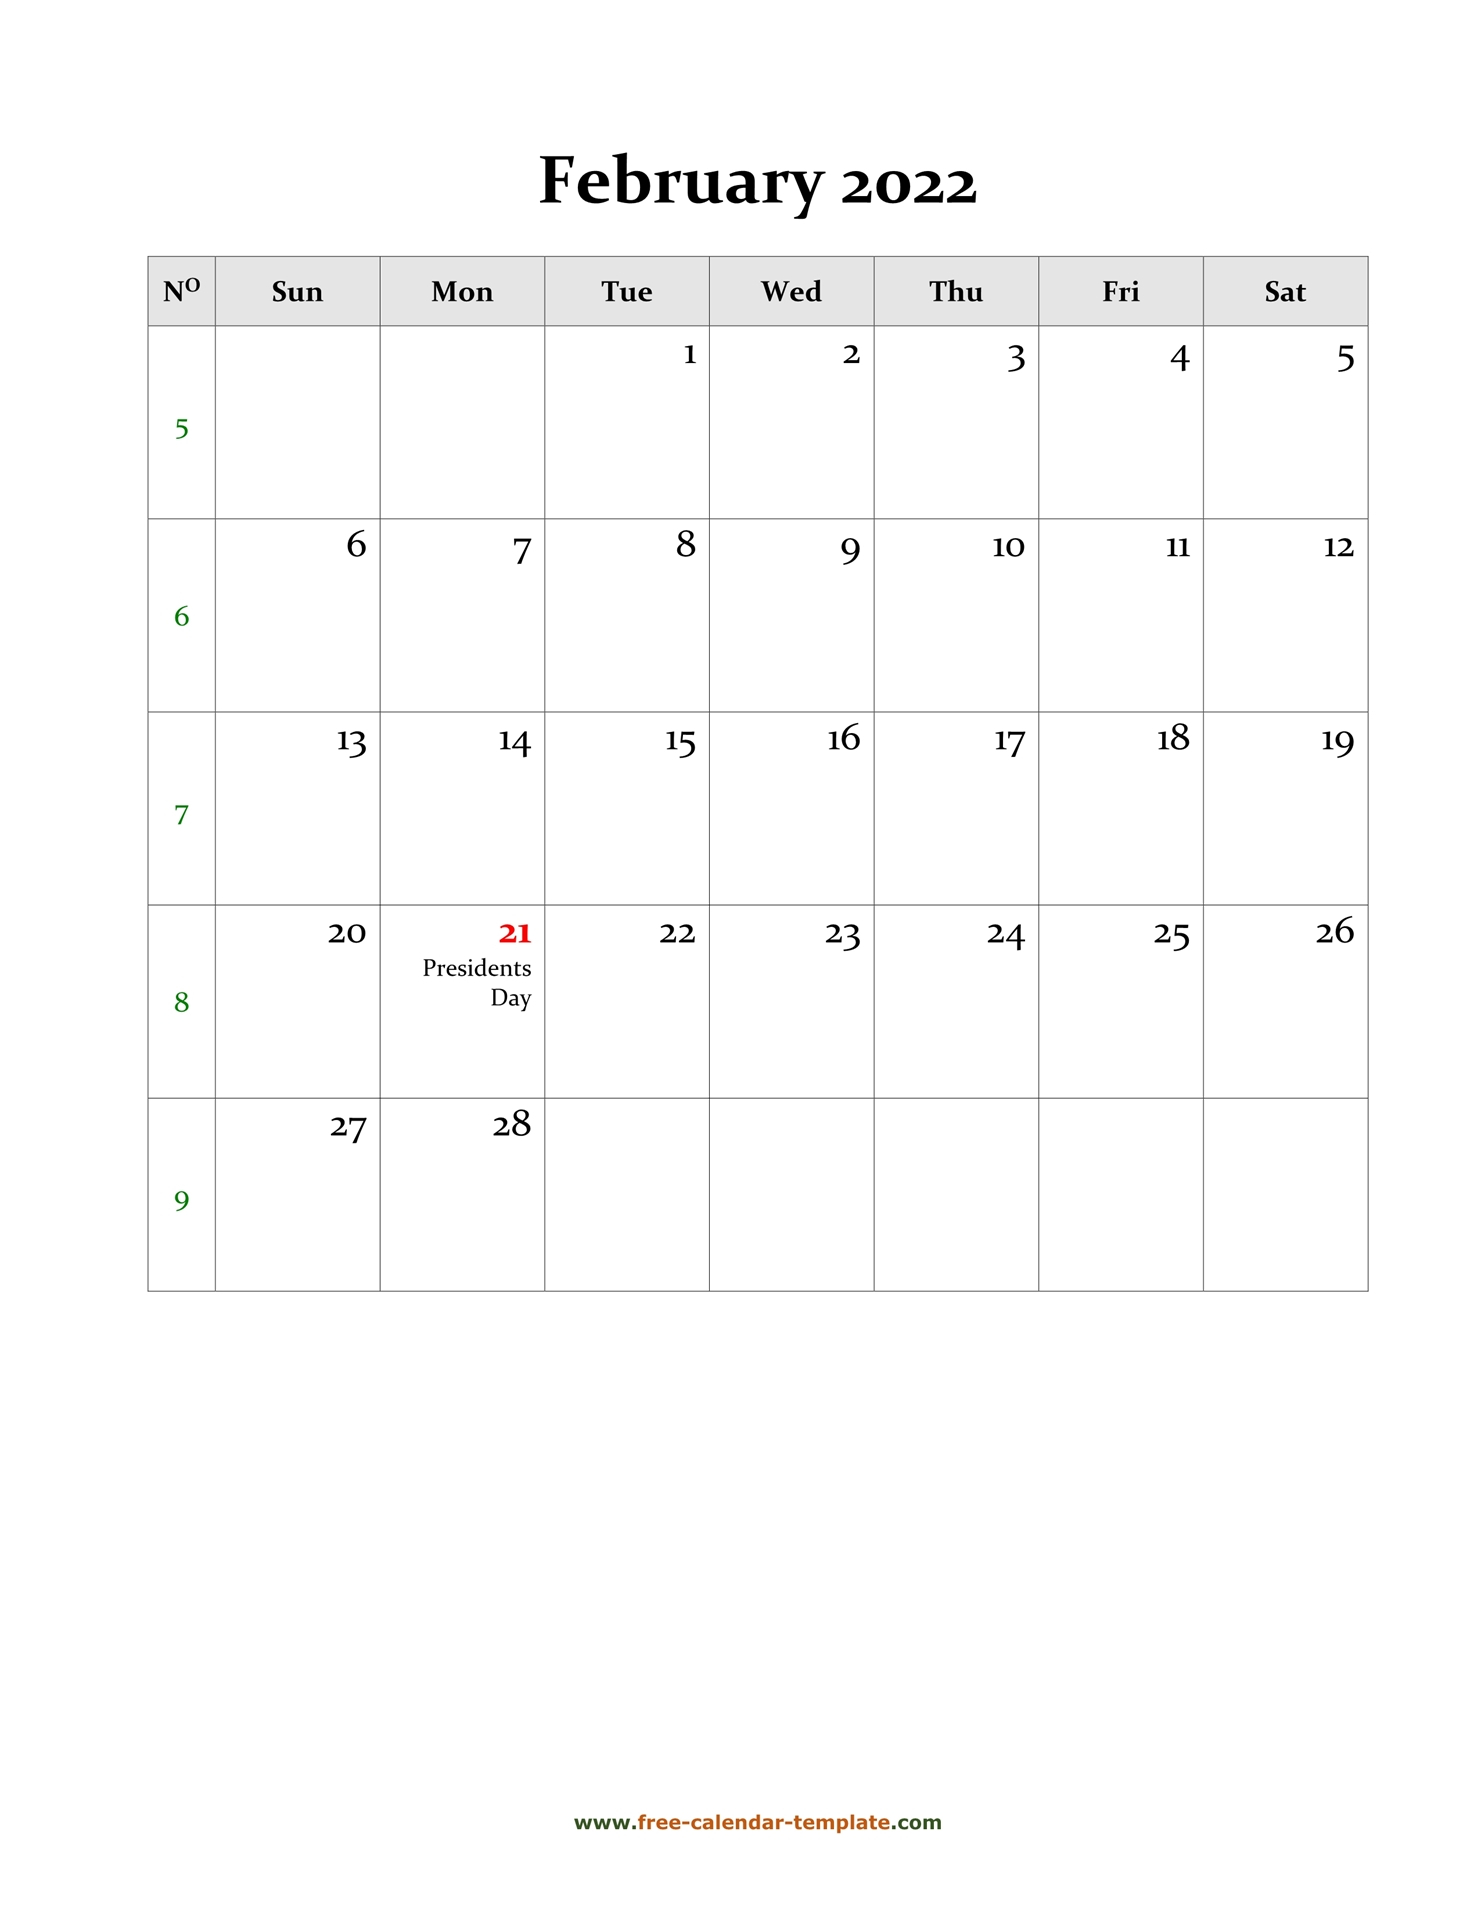 2022 February Calendar (Blank Vertical Template) | Free Pertaining To February 2022 Calendar Printable